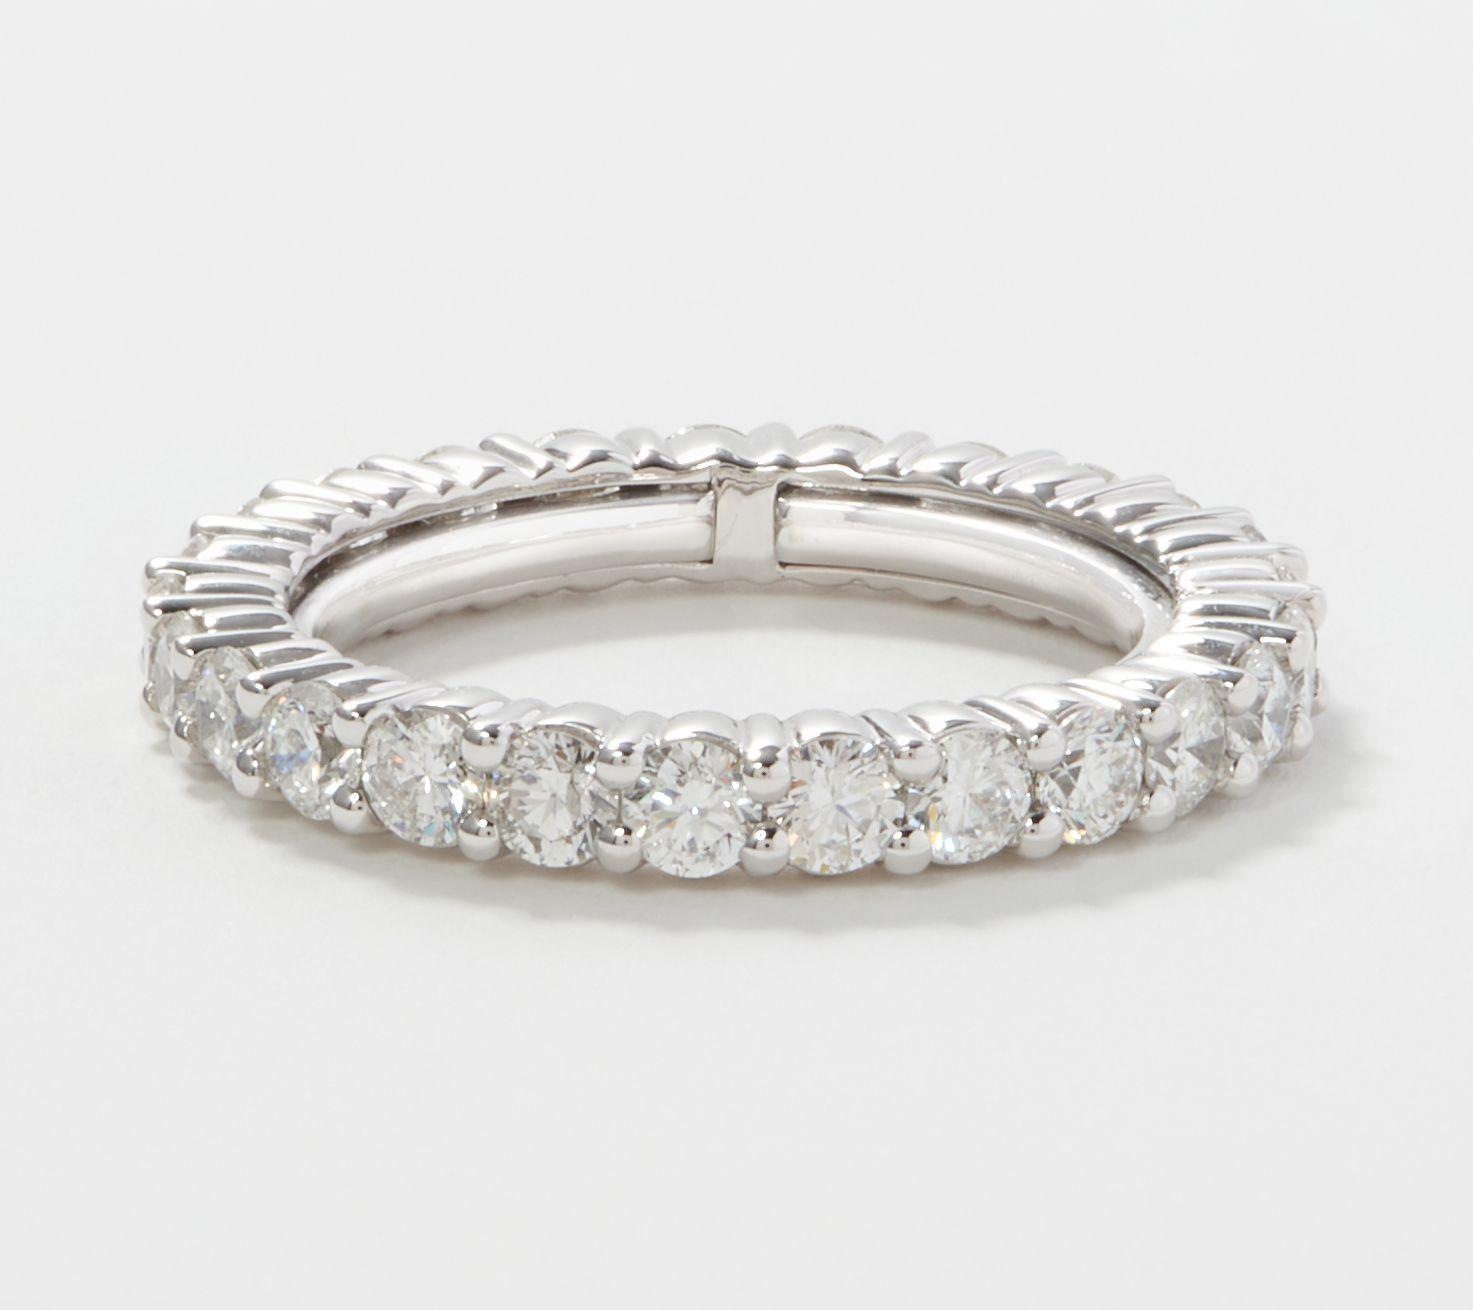 Affinity 14k Gold Flexible Diamond Eternity Ring 1 80 2 30cttw